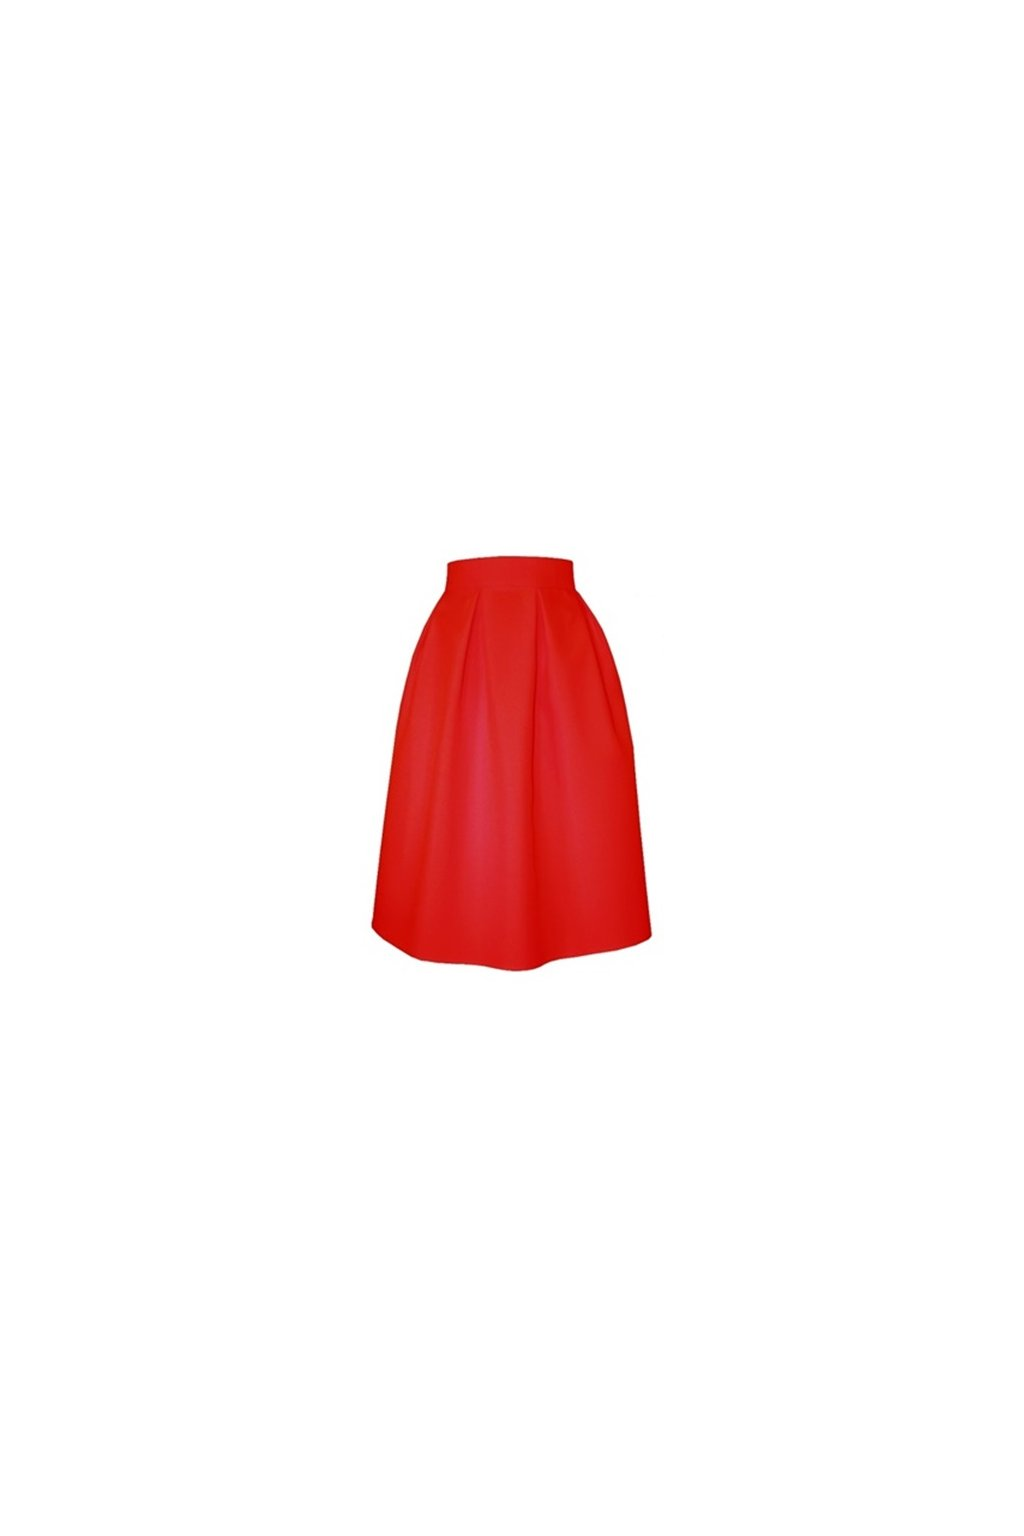 a371d2e4f302 Áčková sukňa s protizáhybmi červená - Tentation.sk